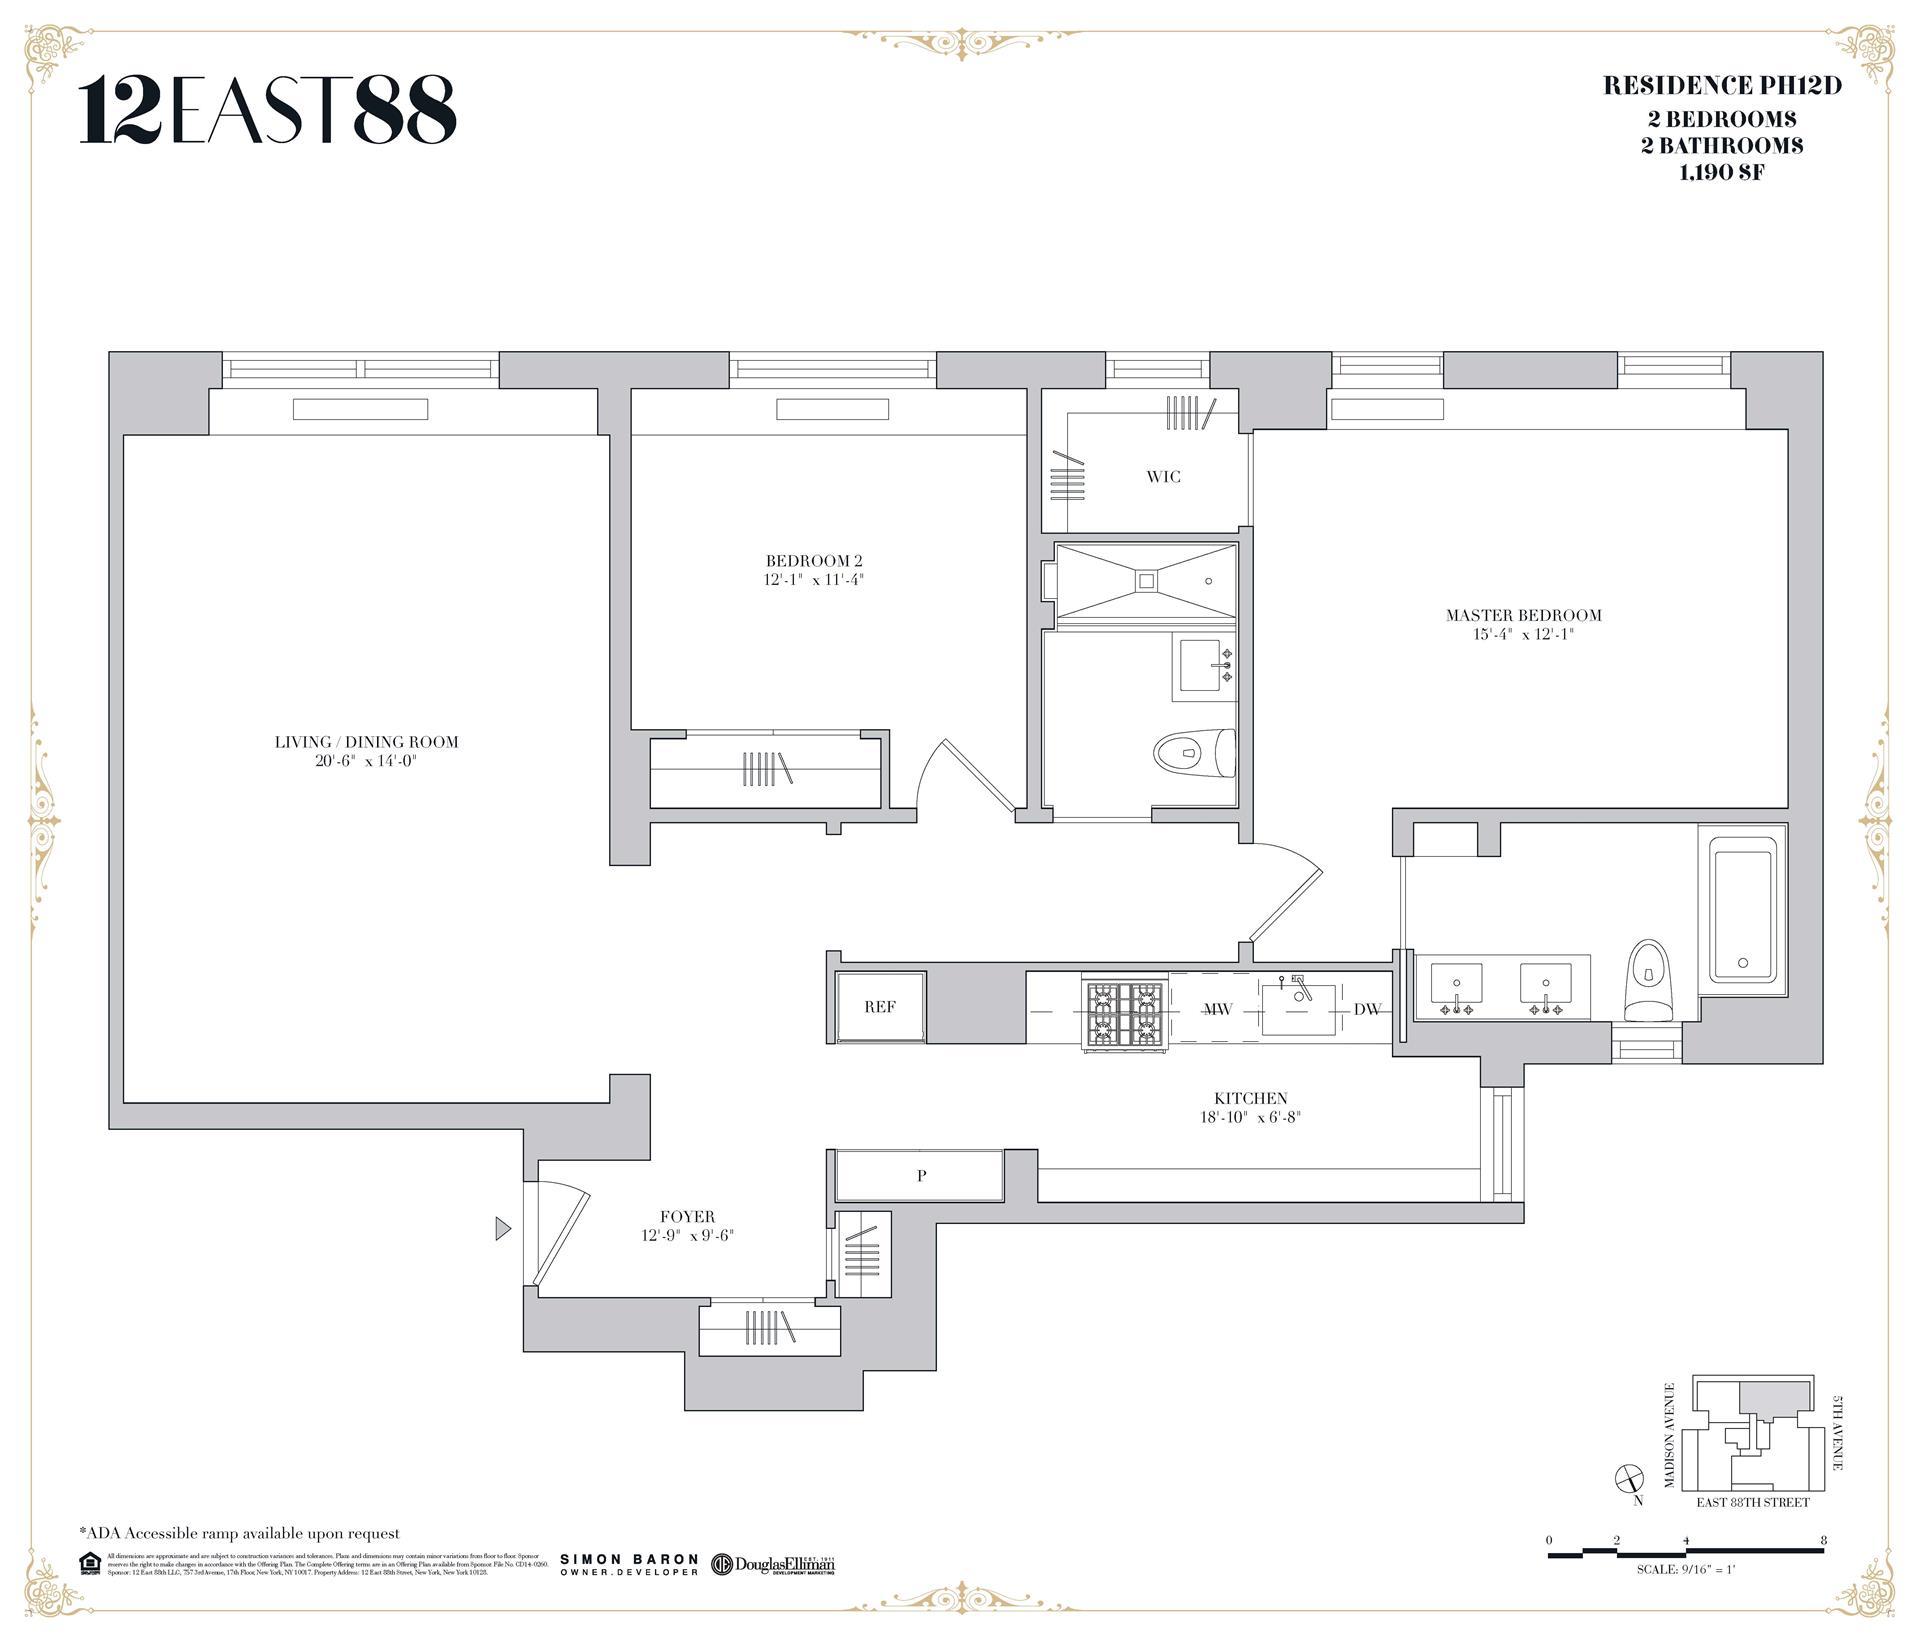 Floor plan of 12 East 88th St, PHD - Carnegie Hill, New York